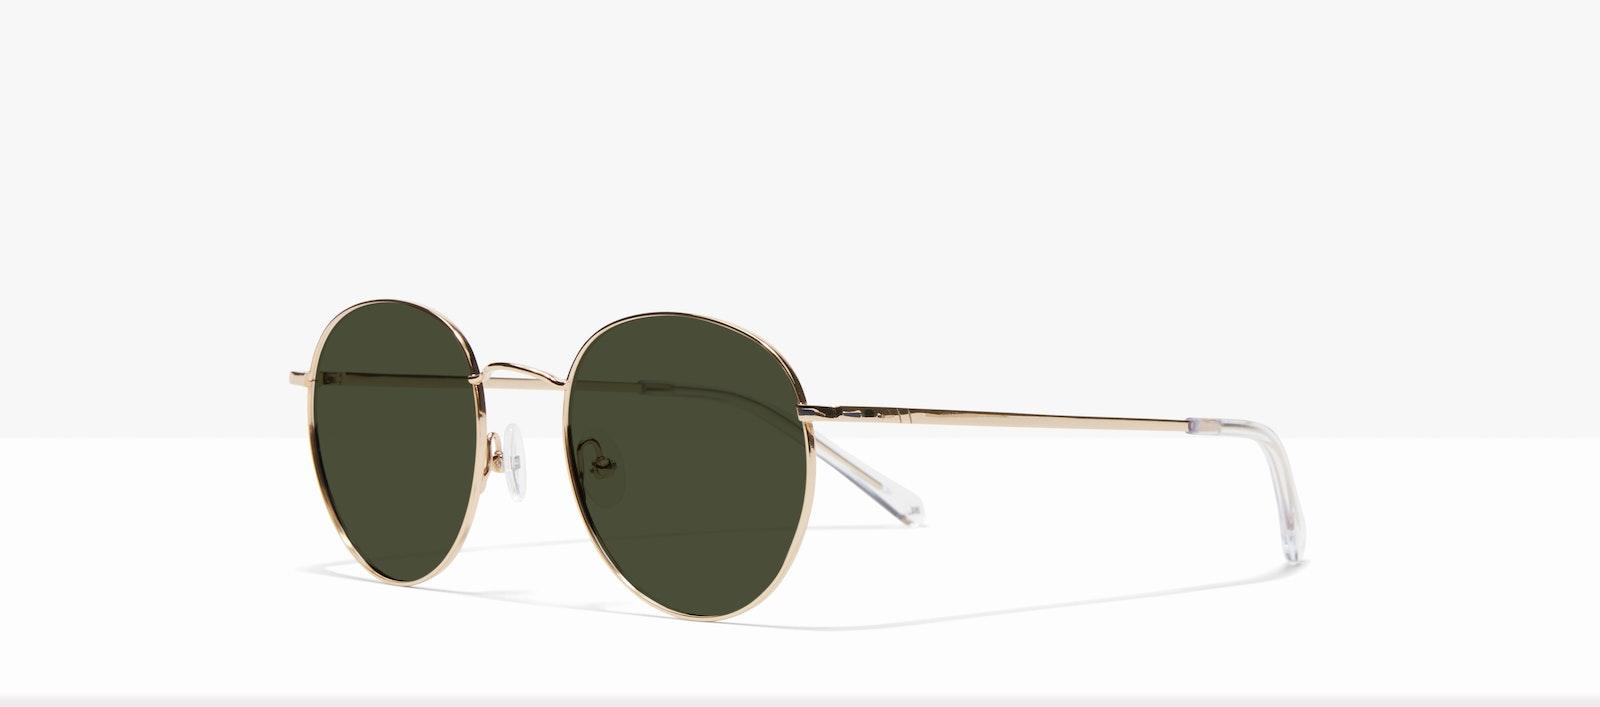 Affordable Fashion Glasses Round Sunglasses Women Calibre Gold Tilt